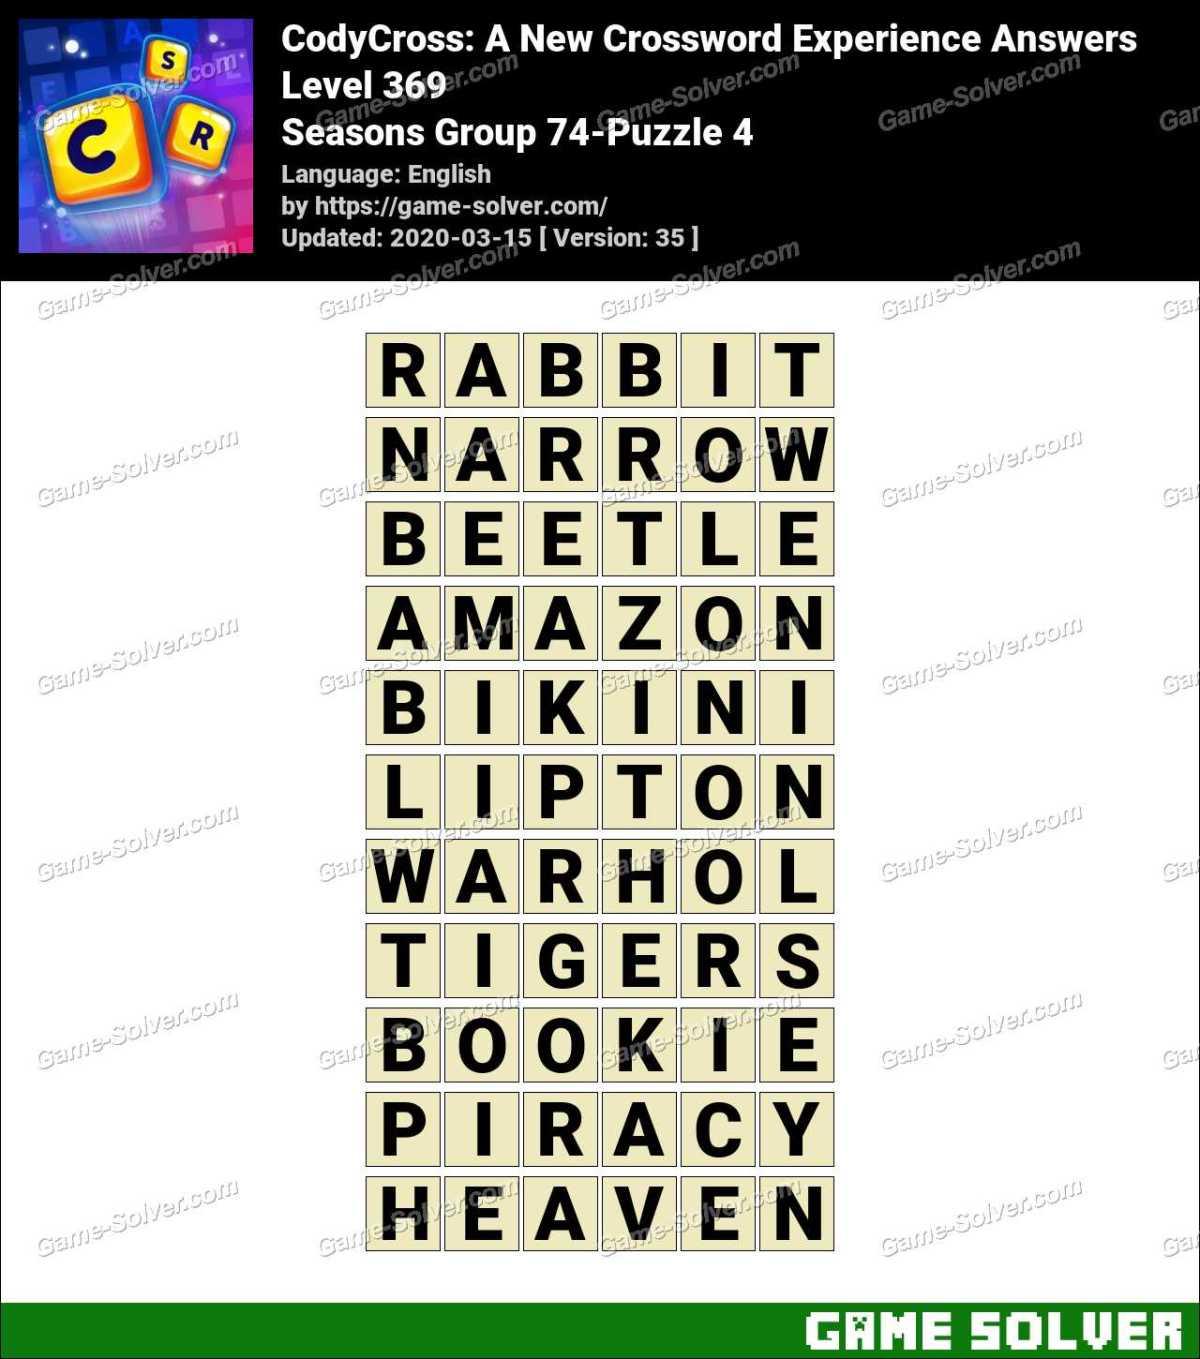 CodyCross Seasons Group 74-Puzzle 4 Answers